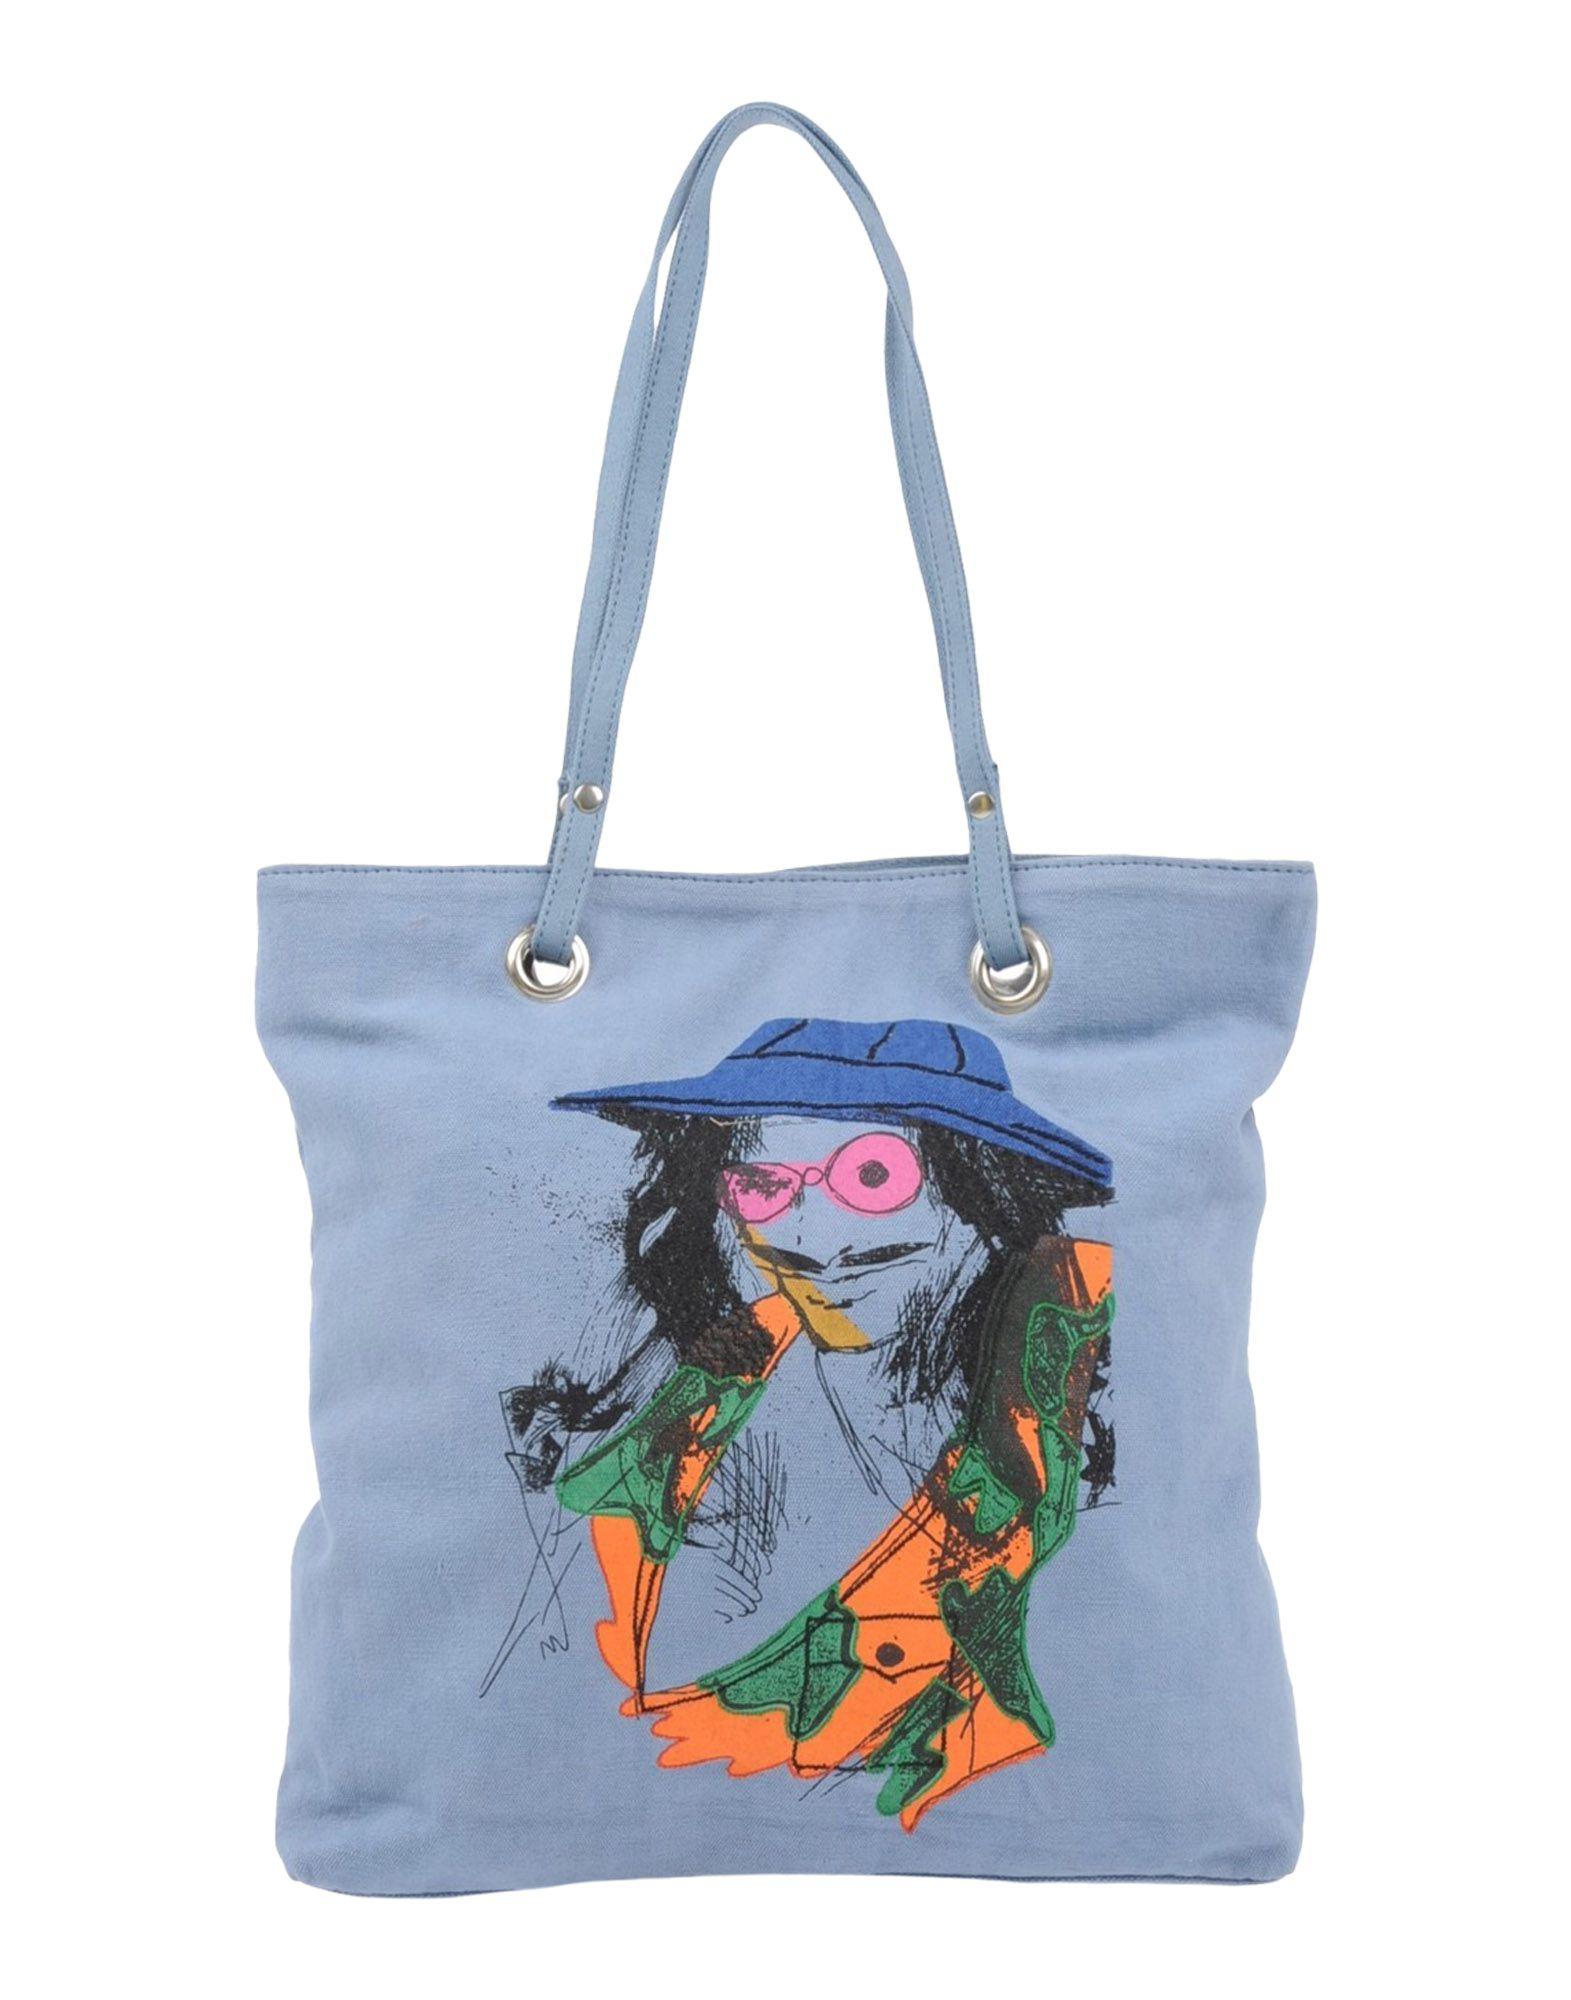 GALLIANO Большая сумка из текстиля